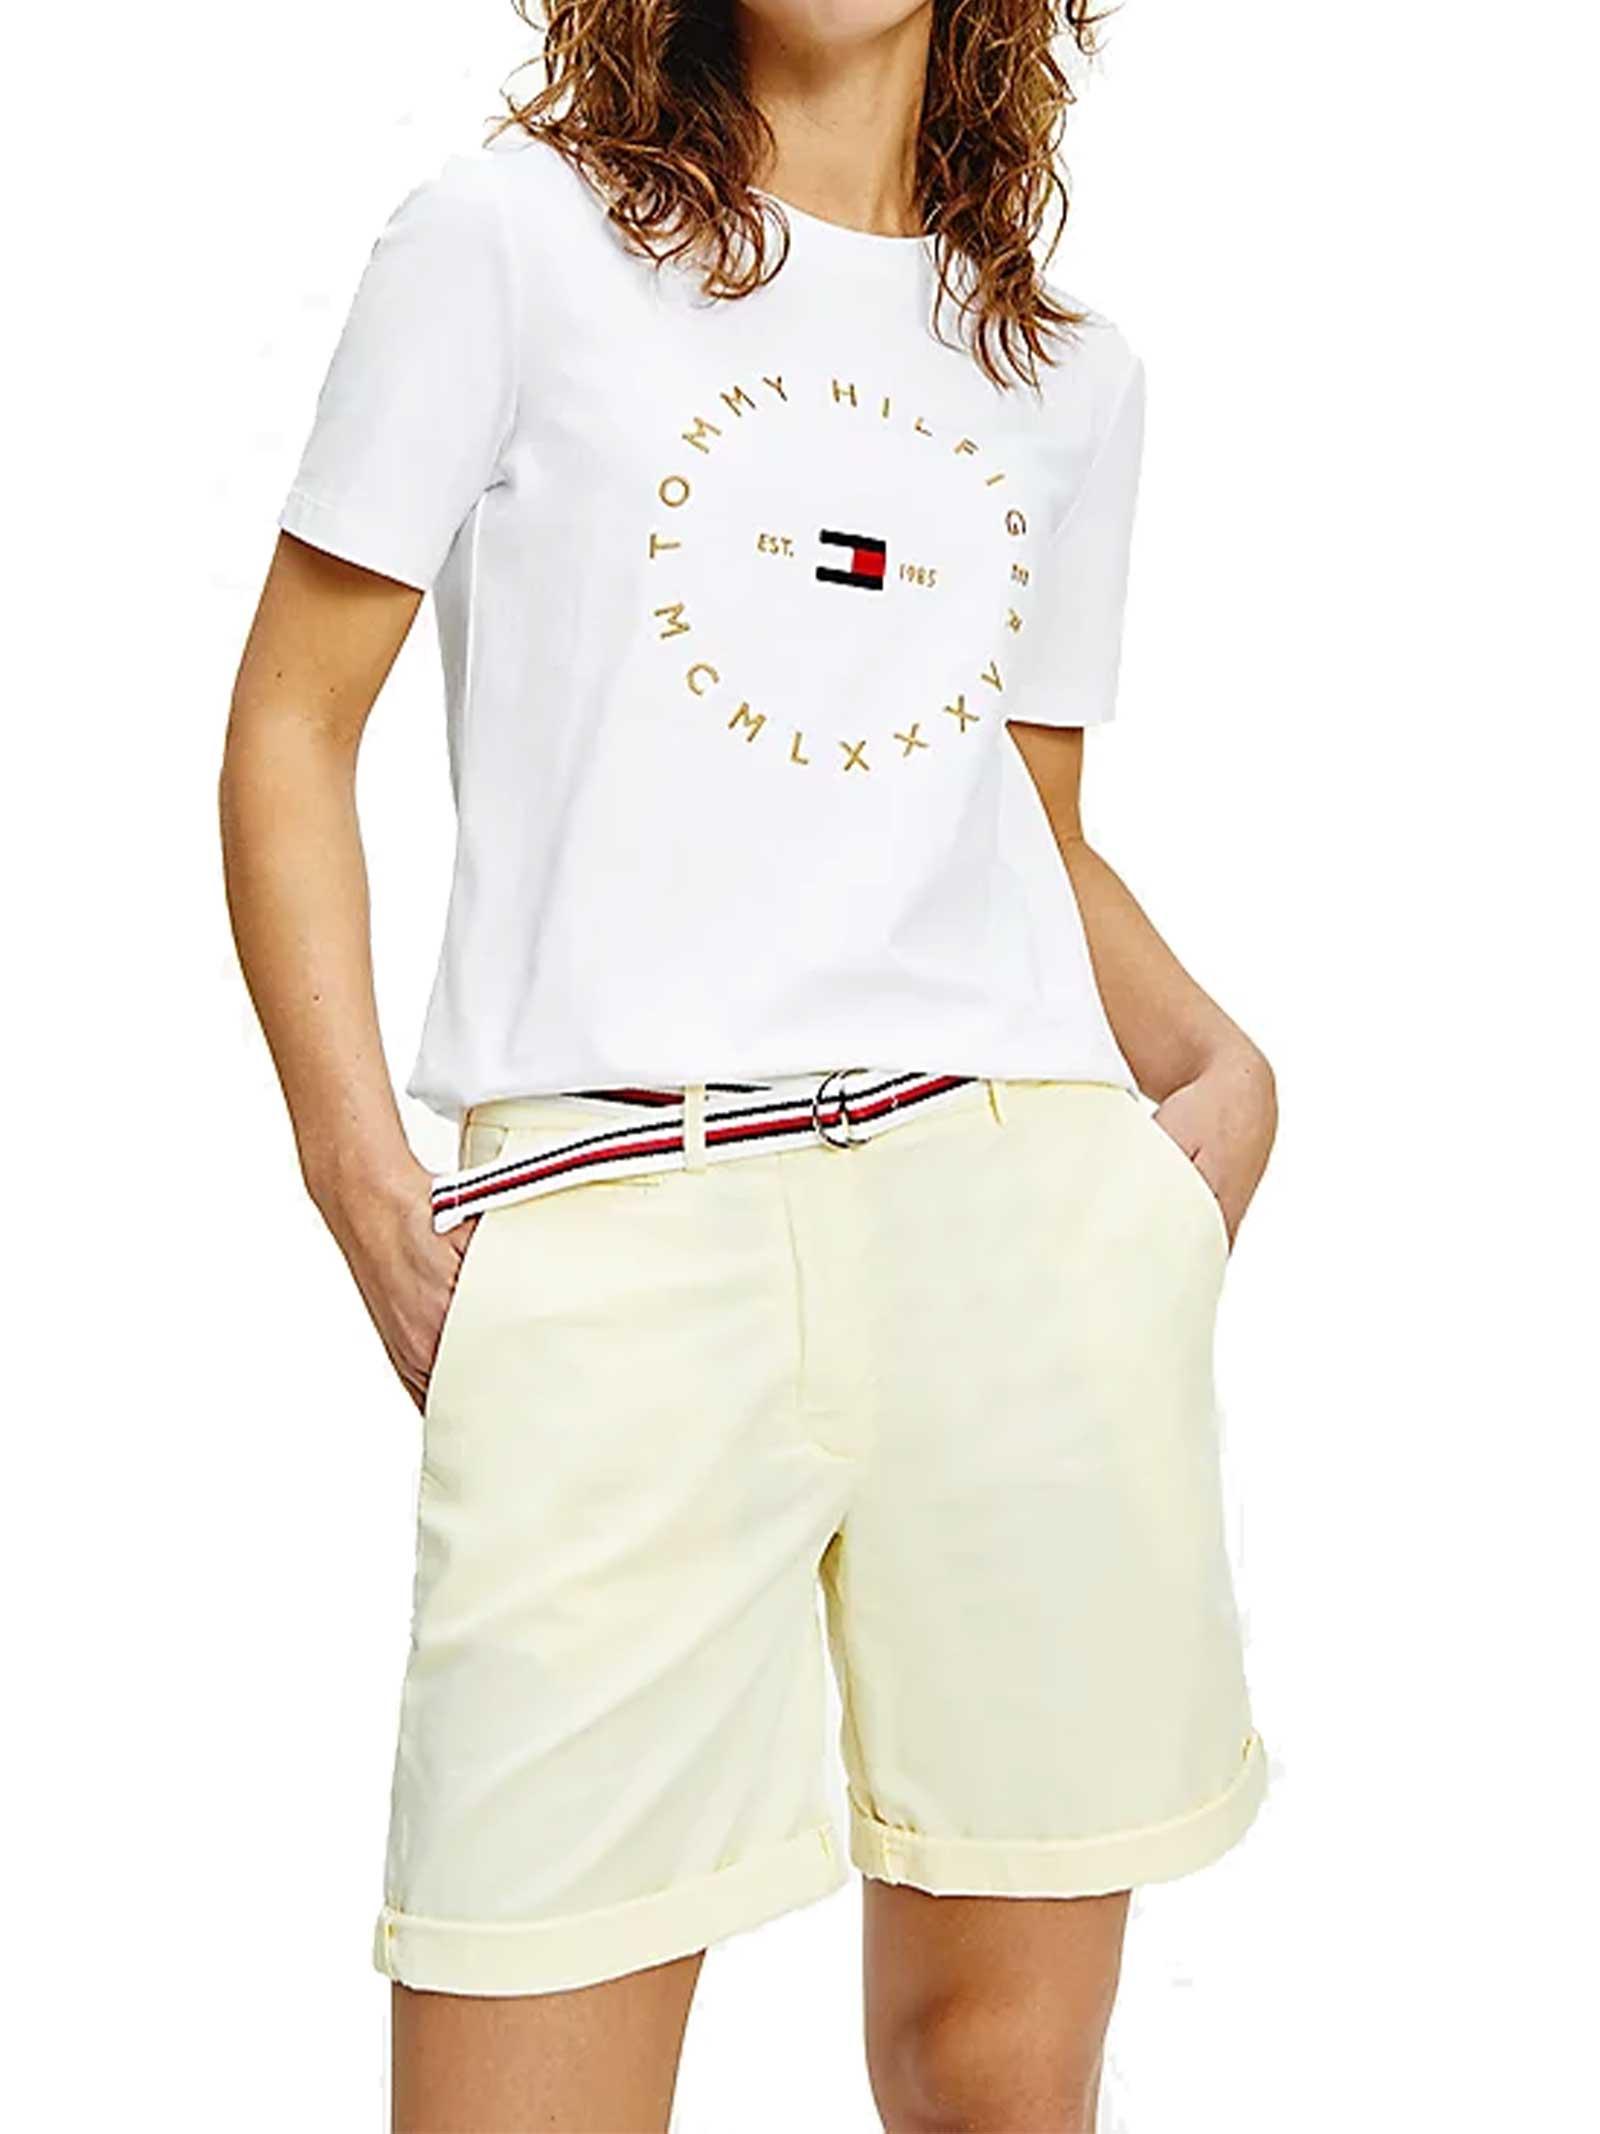 T-SHIRT DONNA TOMMY HILFIGER | T-shirt | WW0WW30103YBR